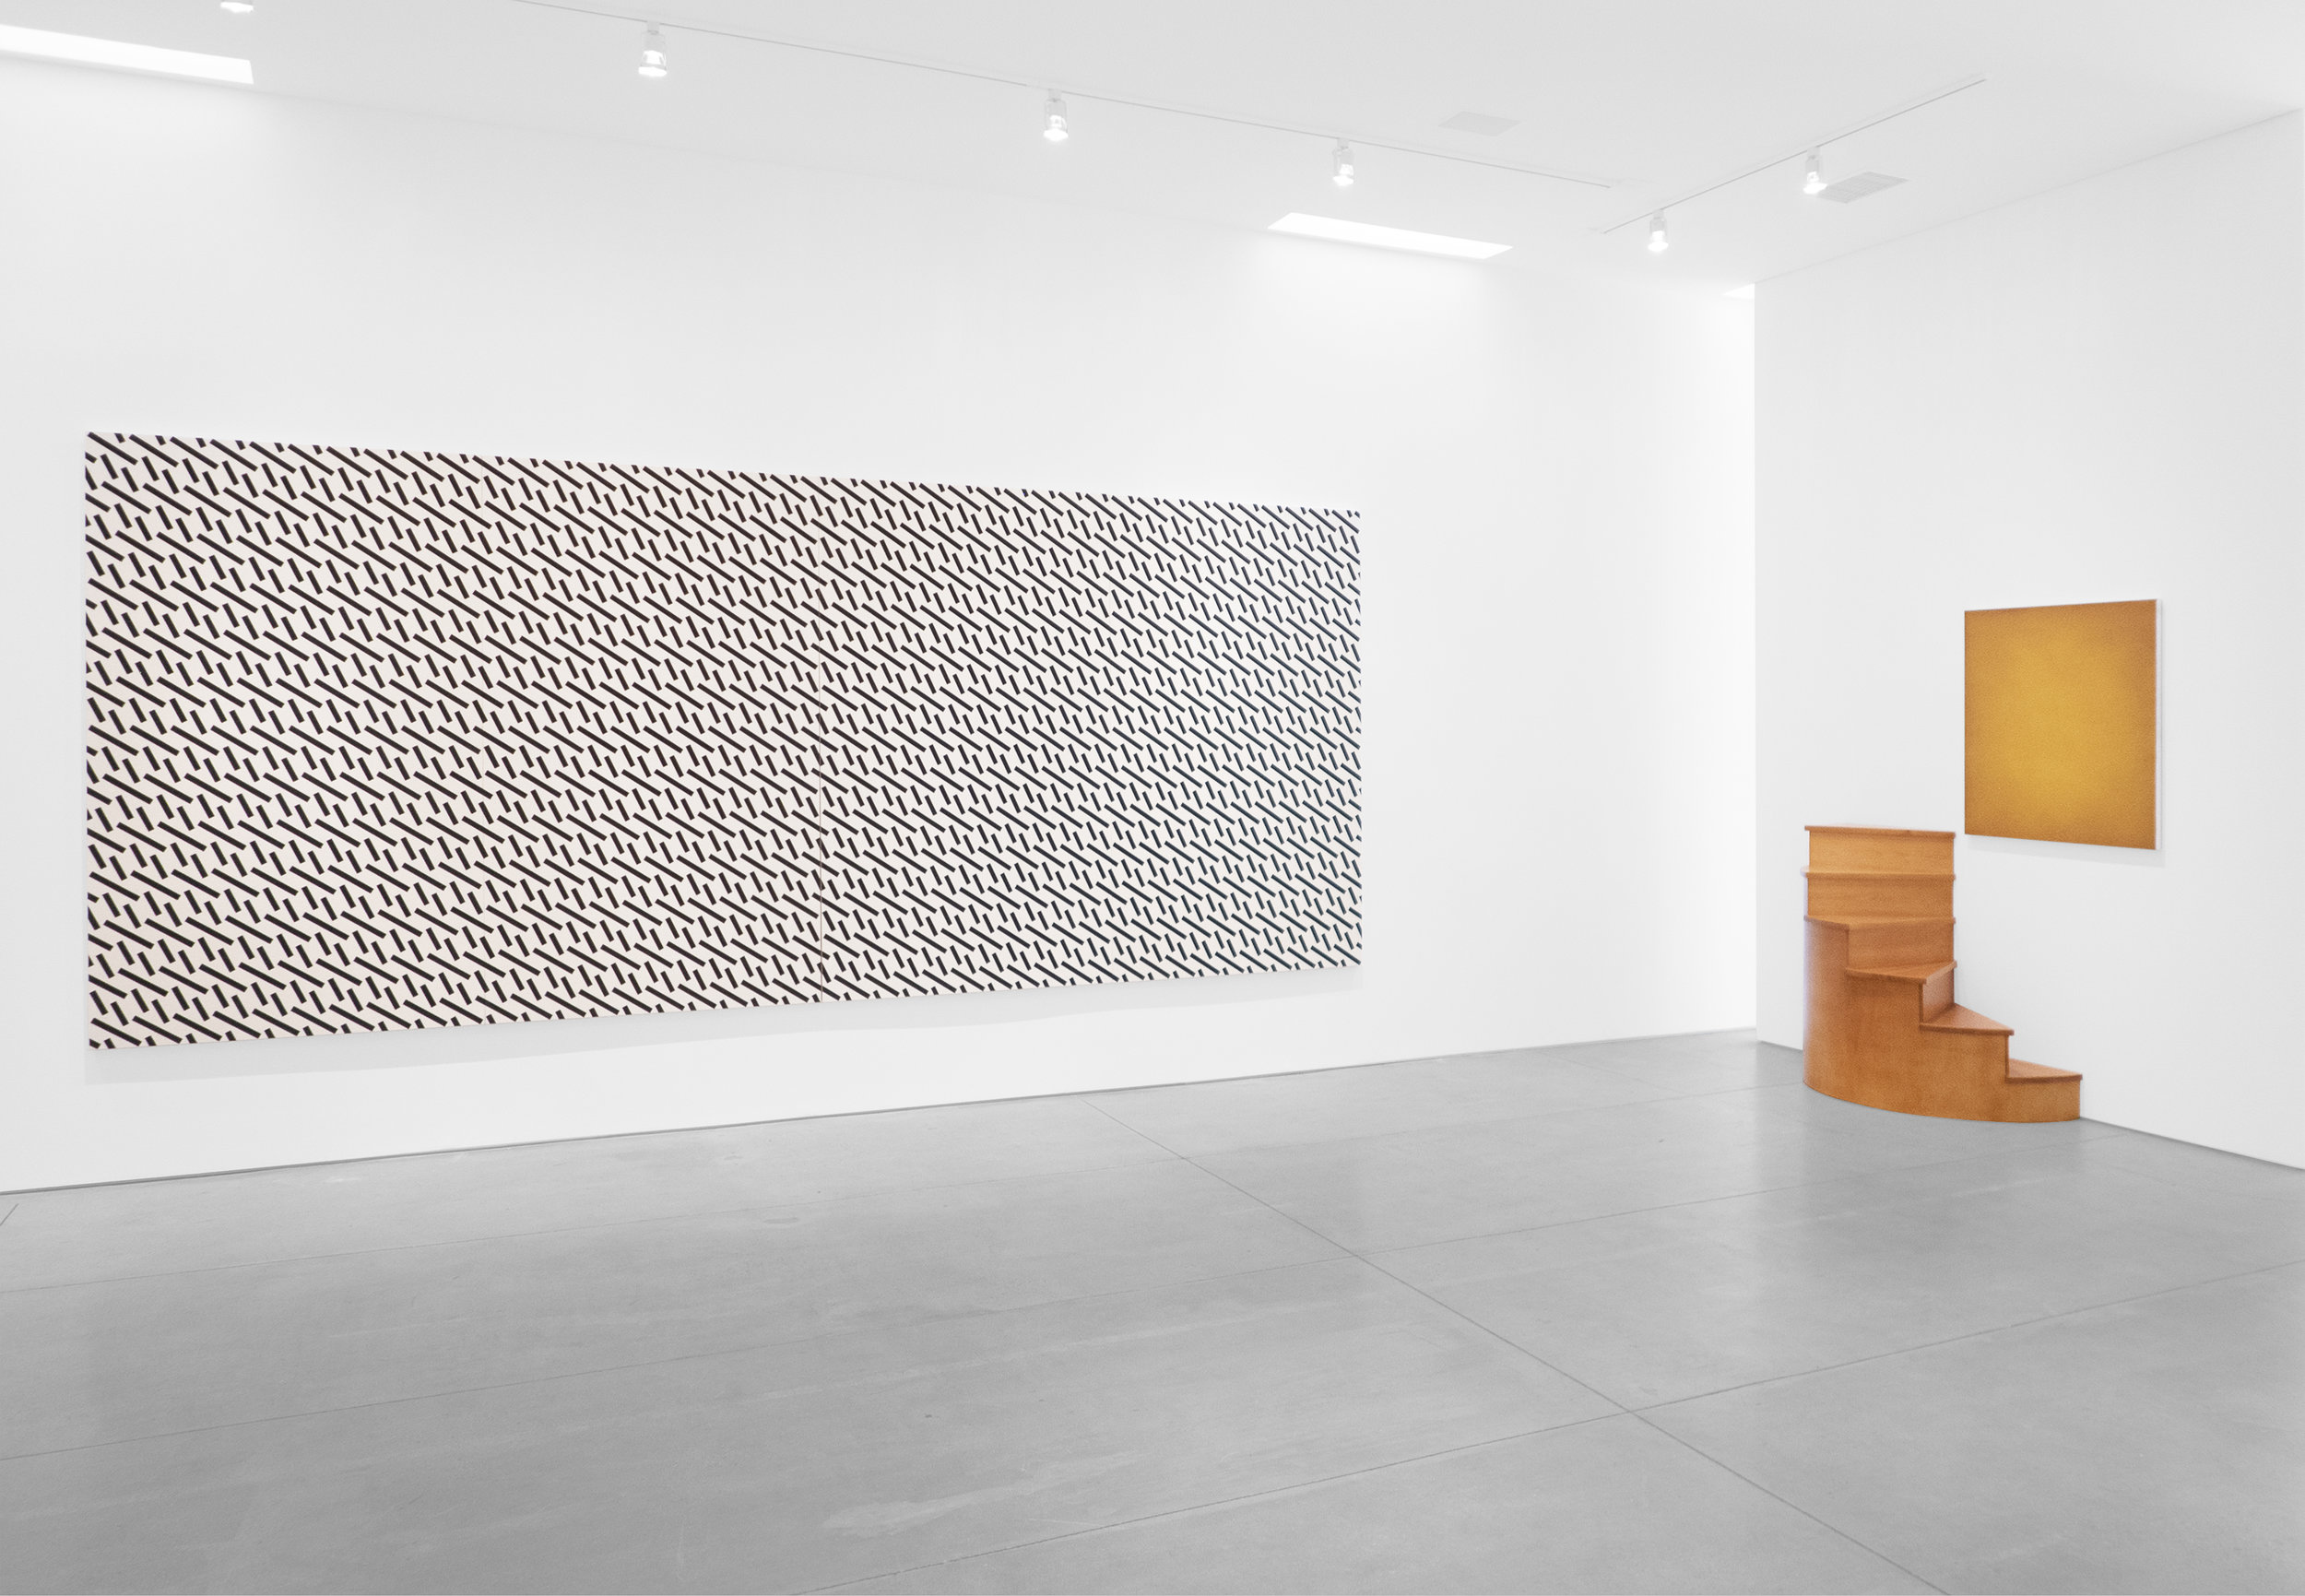 25 Years_Peter Blake Gallery_2019_Installation View_24.jpg